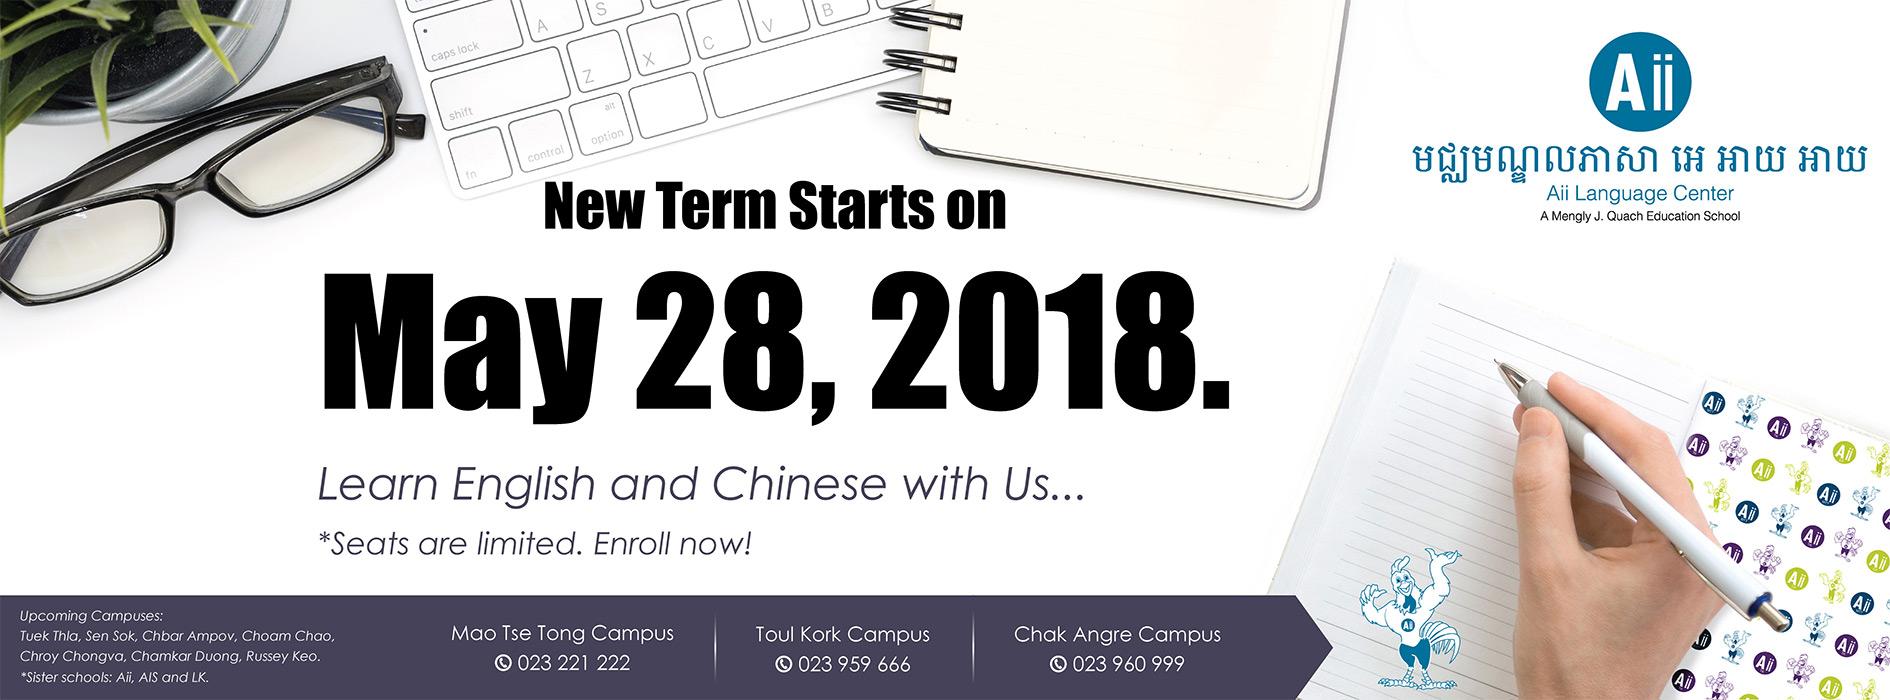 AiiLC-New-Term-57-Website-Slide-Show